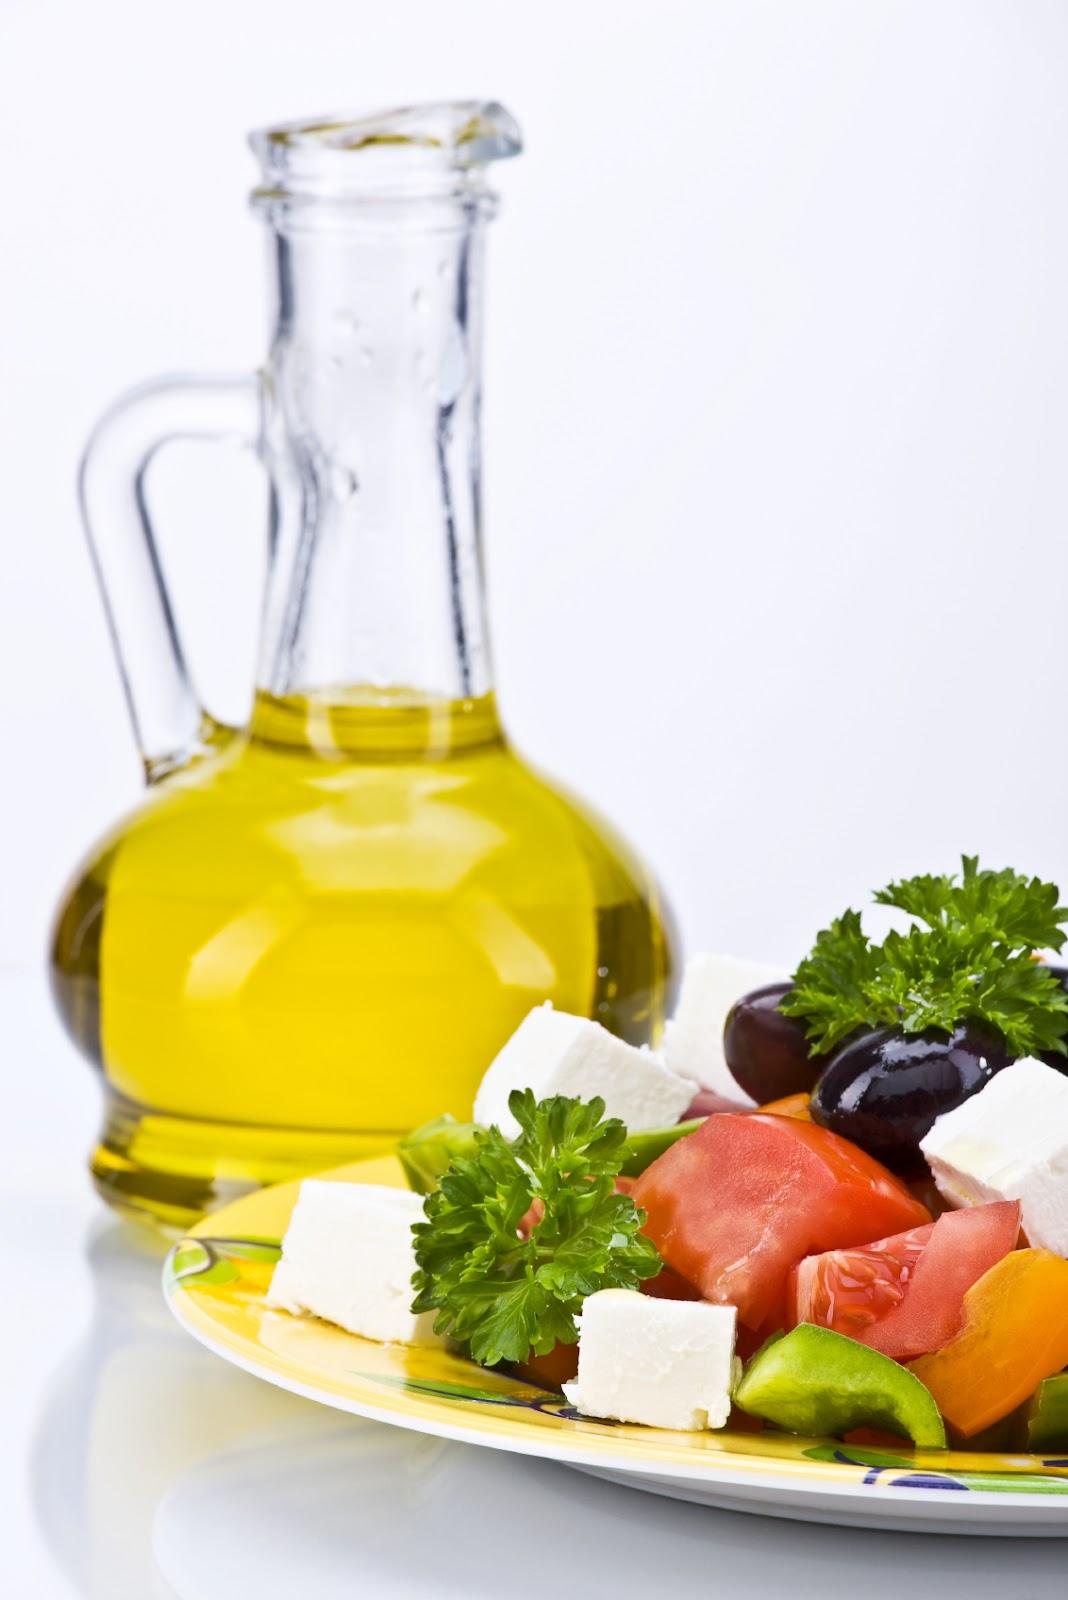 rapeseed oil tips for your health. Black Bedroom Furniture Sets. Home Design Ideas